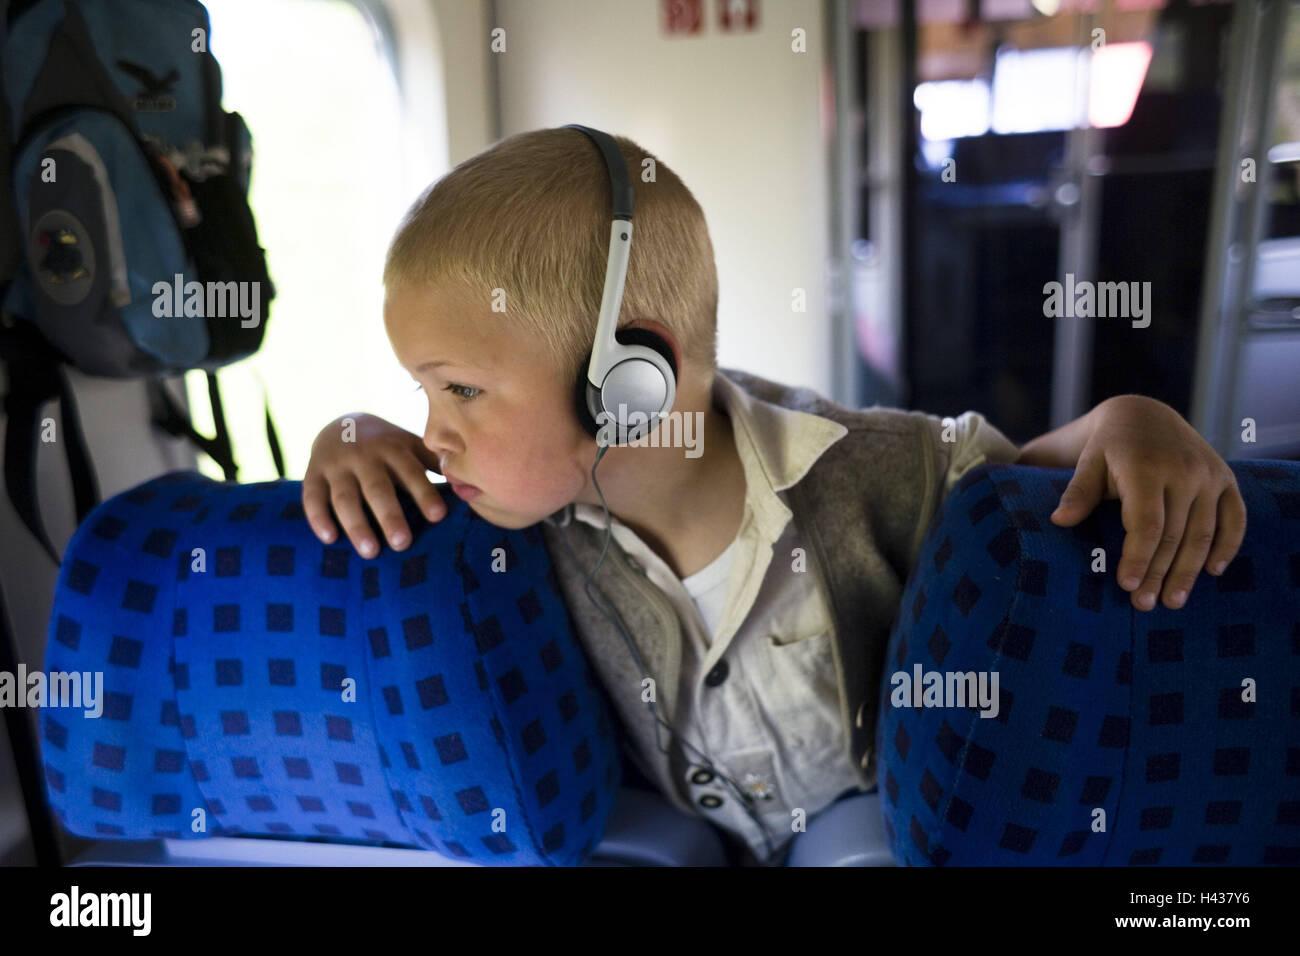 Train, child, earphone, person, boy, blond, MP3 player